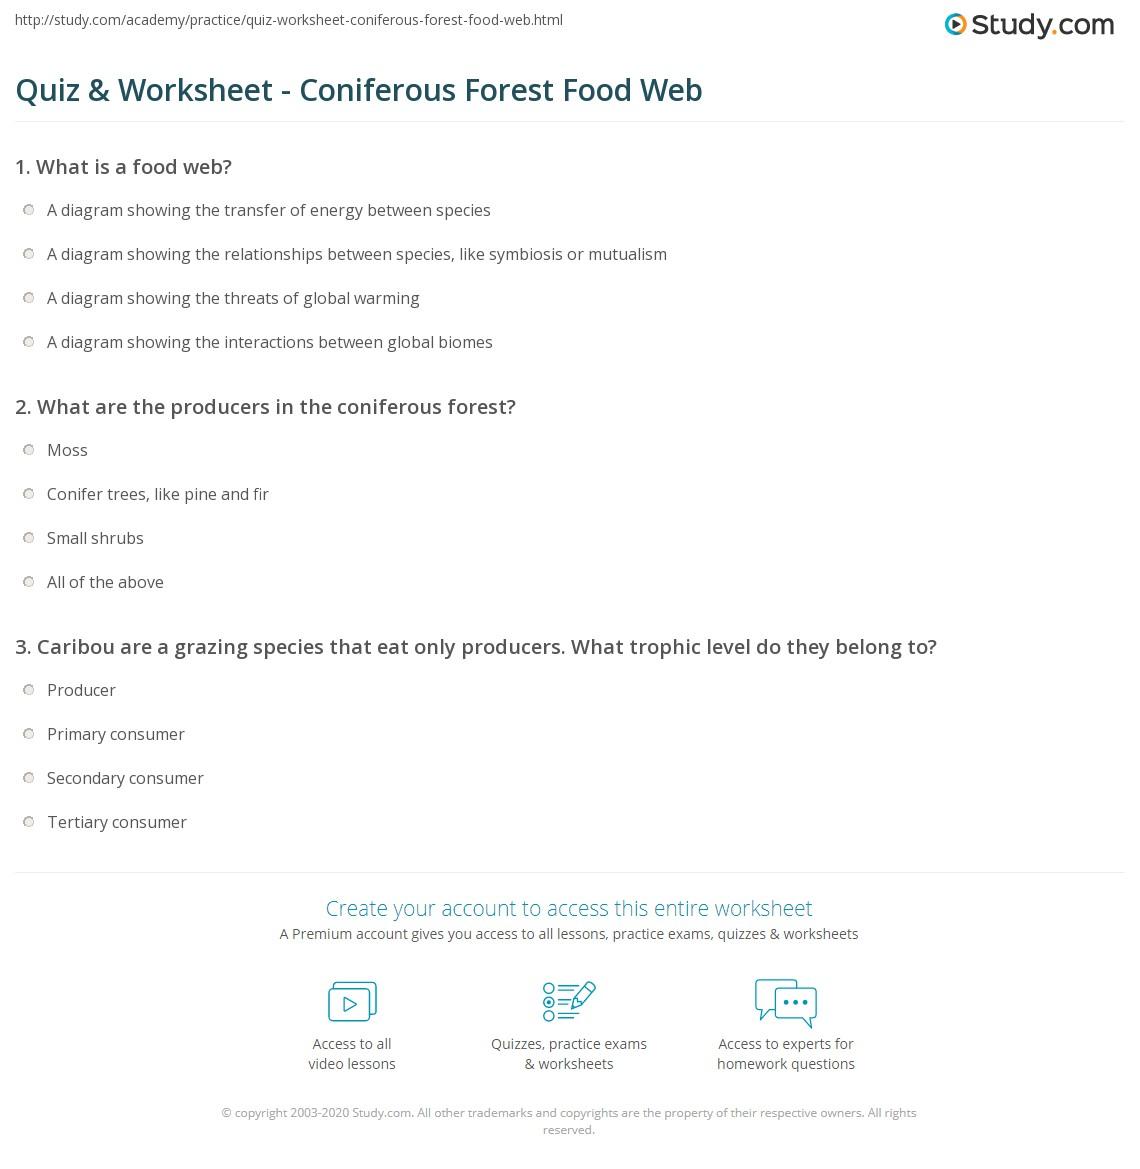 worksheet Food Web Worksheet Answers food web practice worksheet answers printable blog quiz coniferous forest study